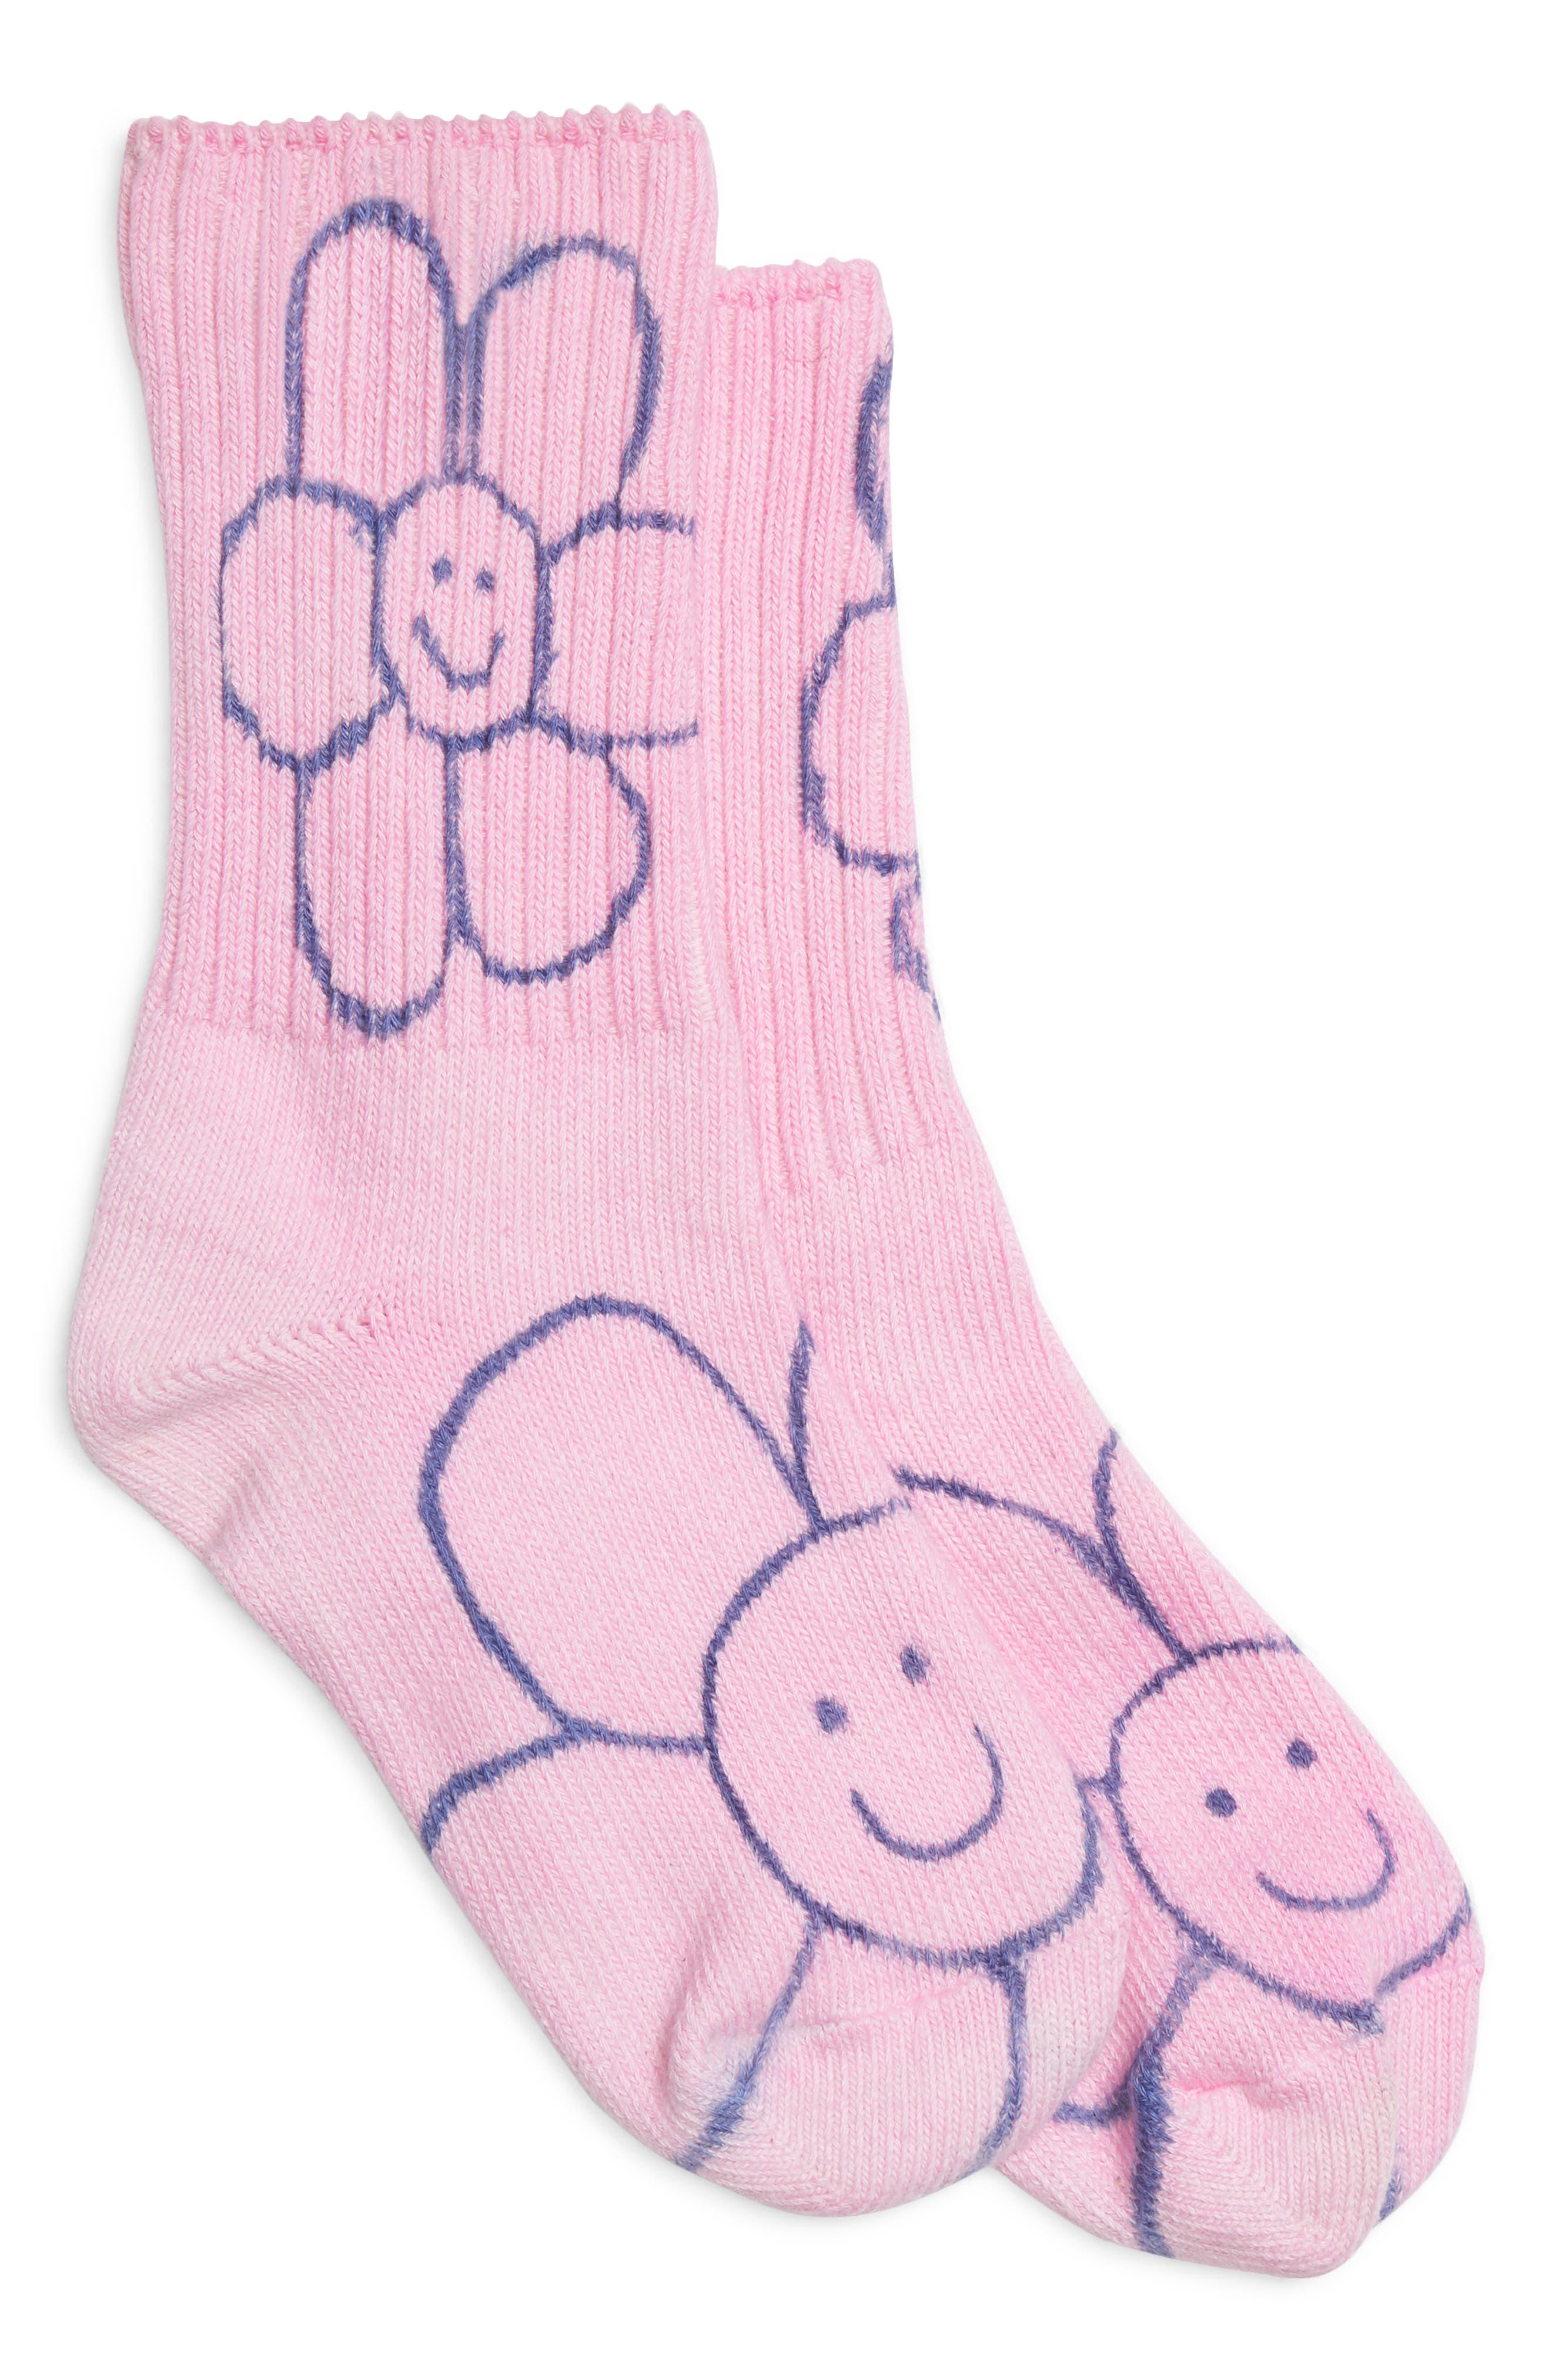 Happy Flowers Socks